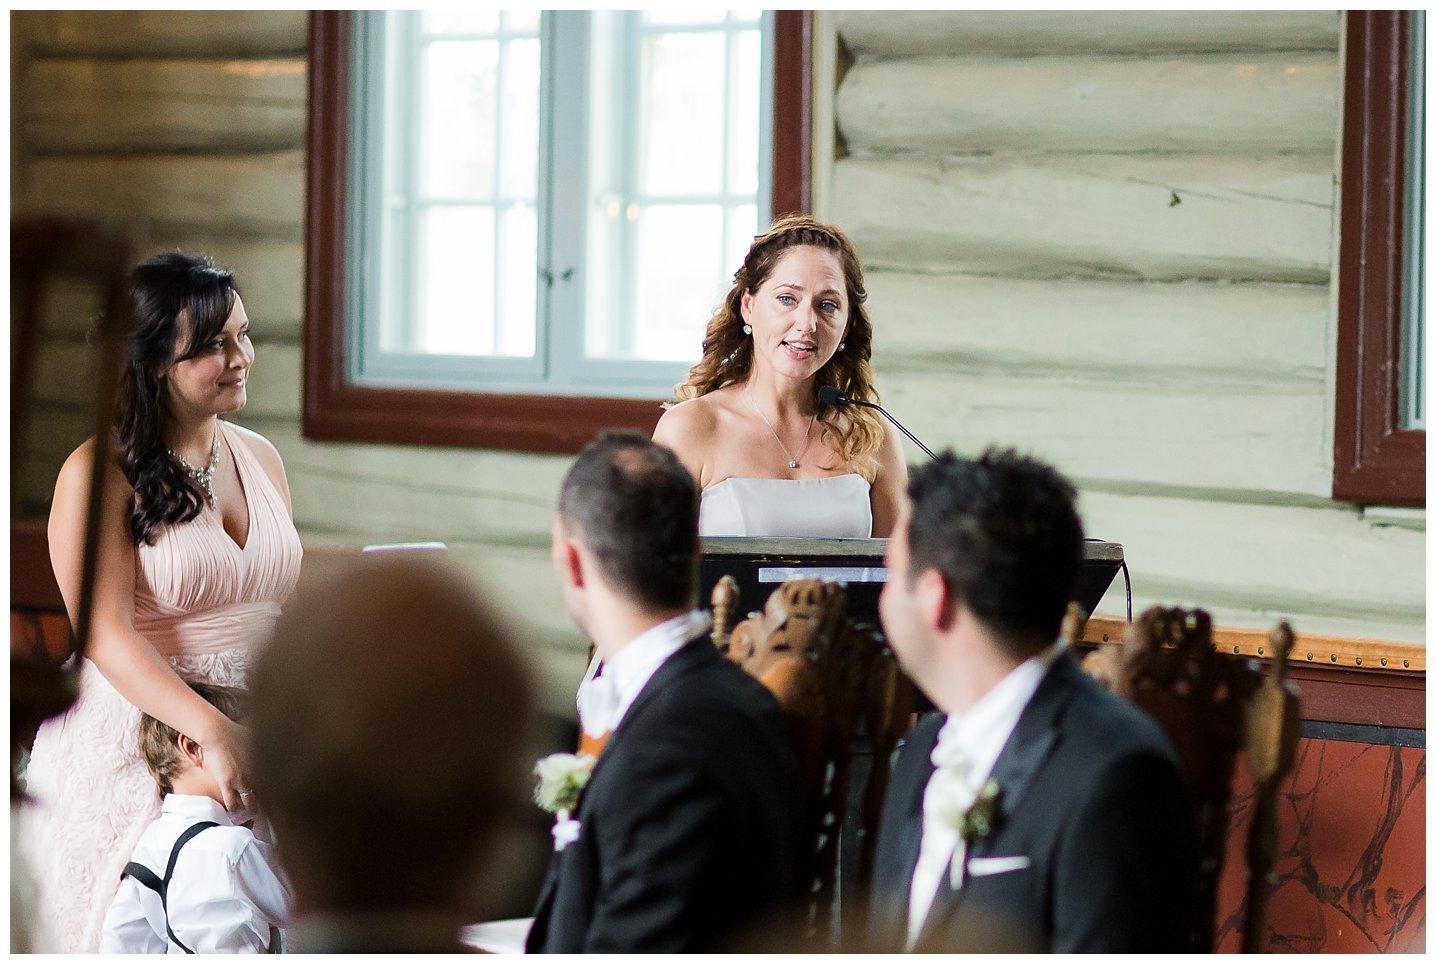 Fotograf-Eline-Jacobine-Bryllup-Villa-Malla-Camilla-og-Alexander_0070